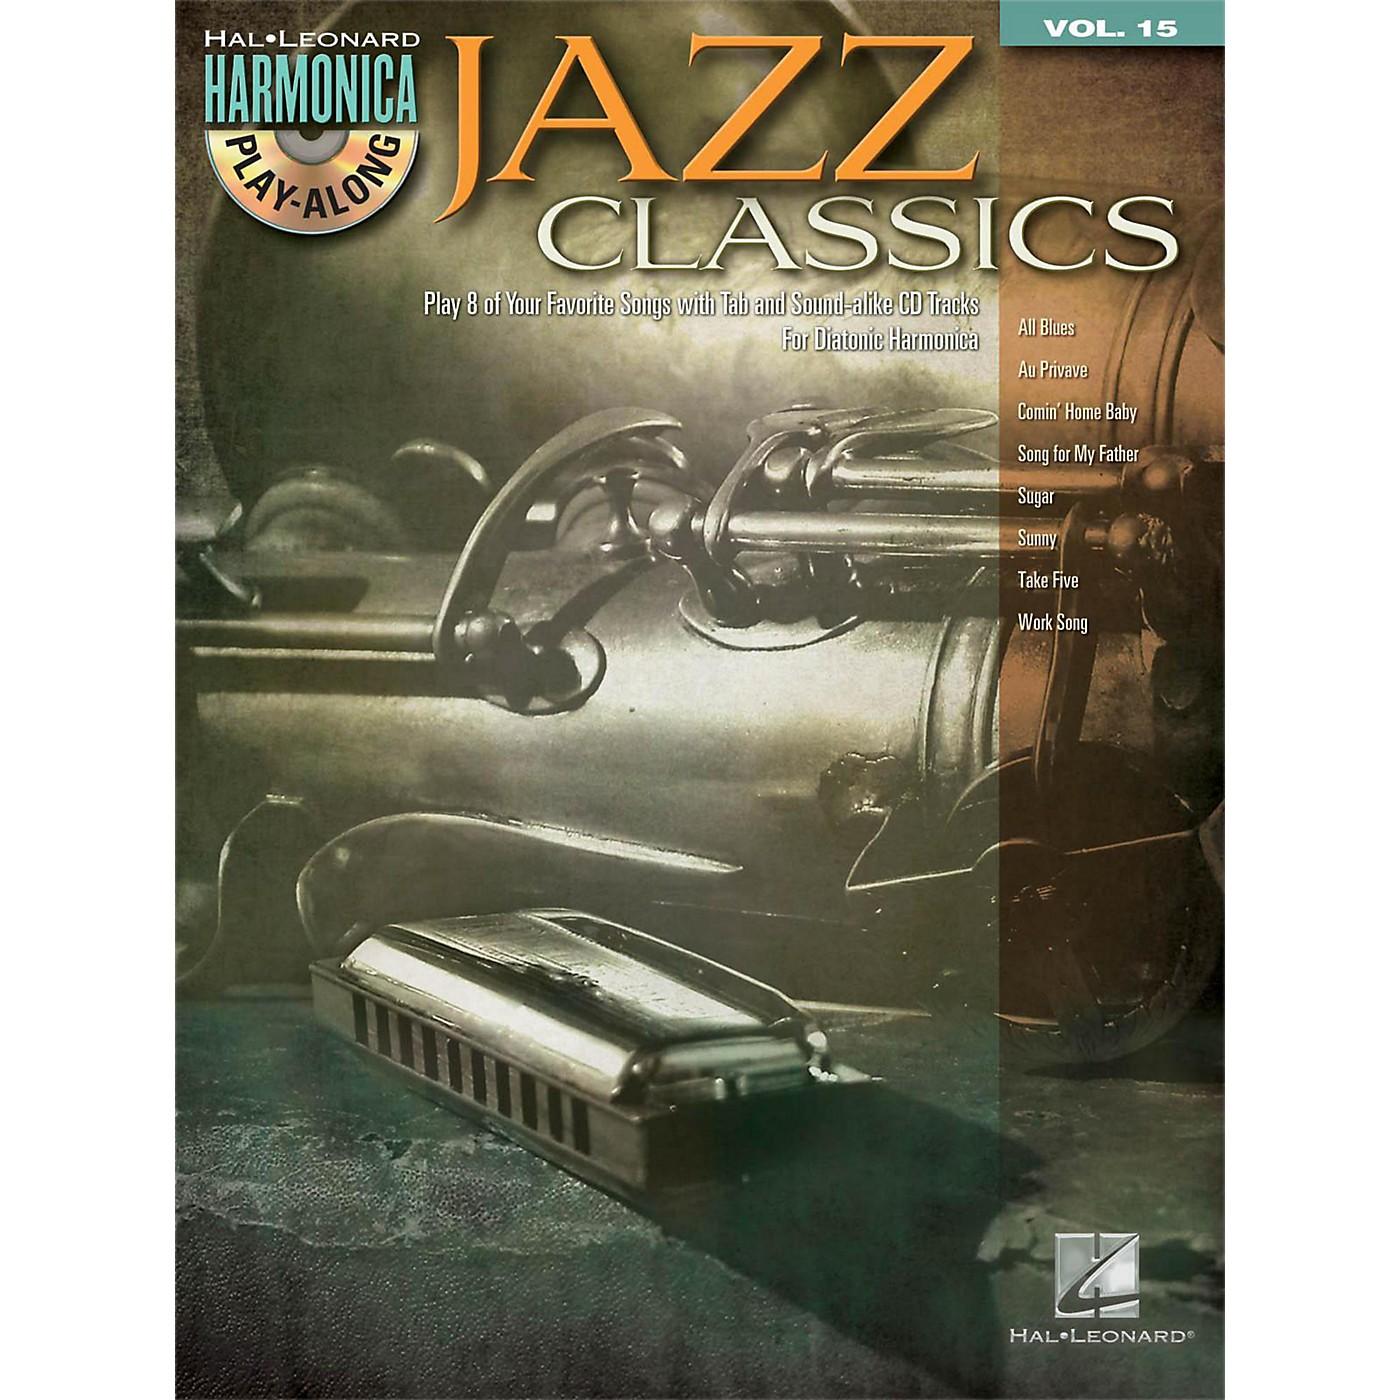 Hal Leonard Jazz Classics - Harmonica Play-Along Volume 15 Book/CD (Diatonic Harmonica) thumbnail